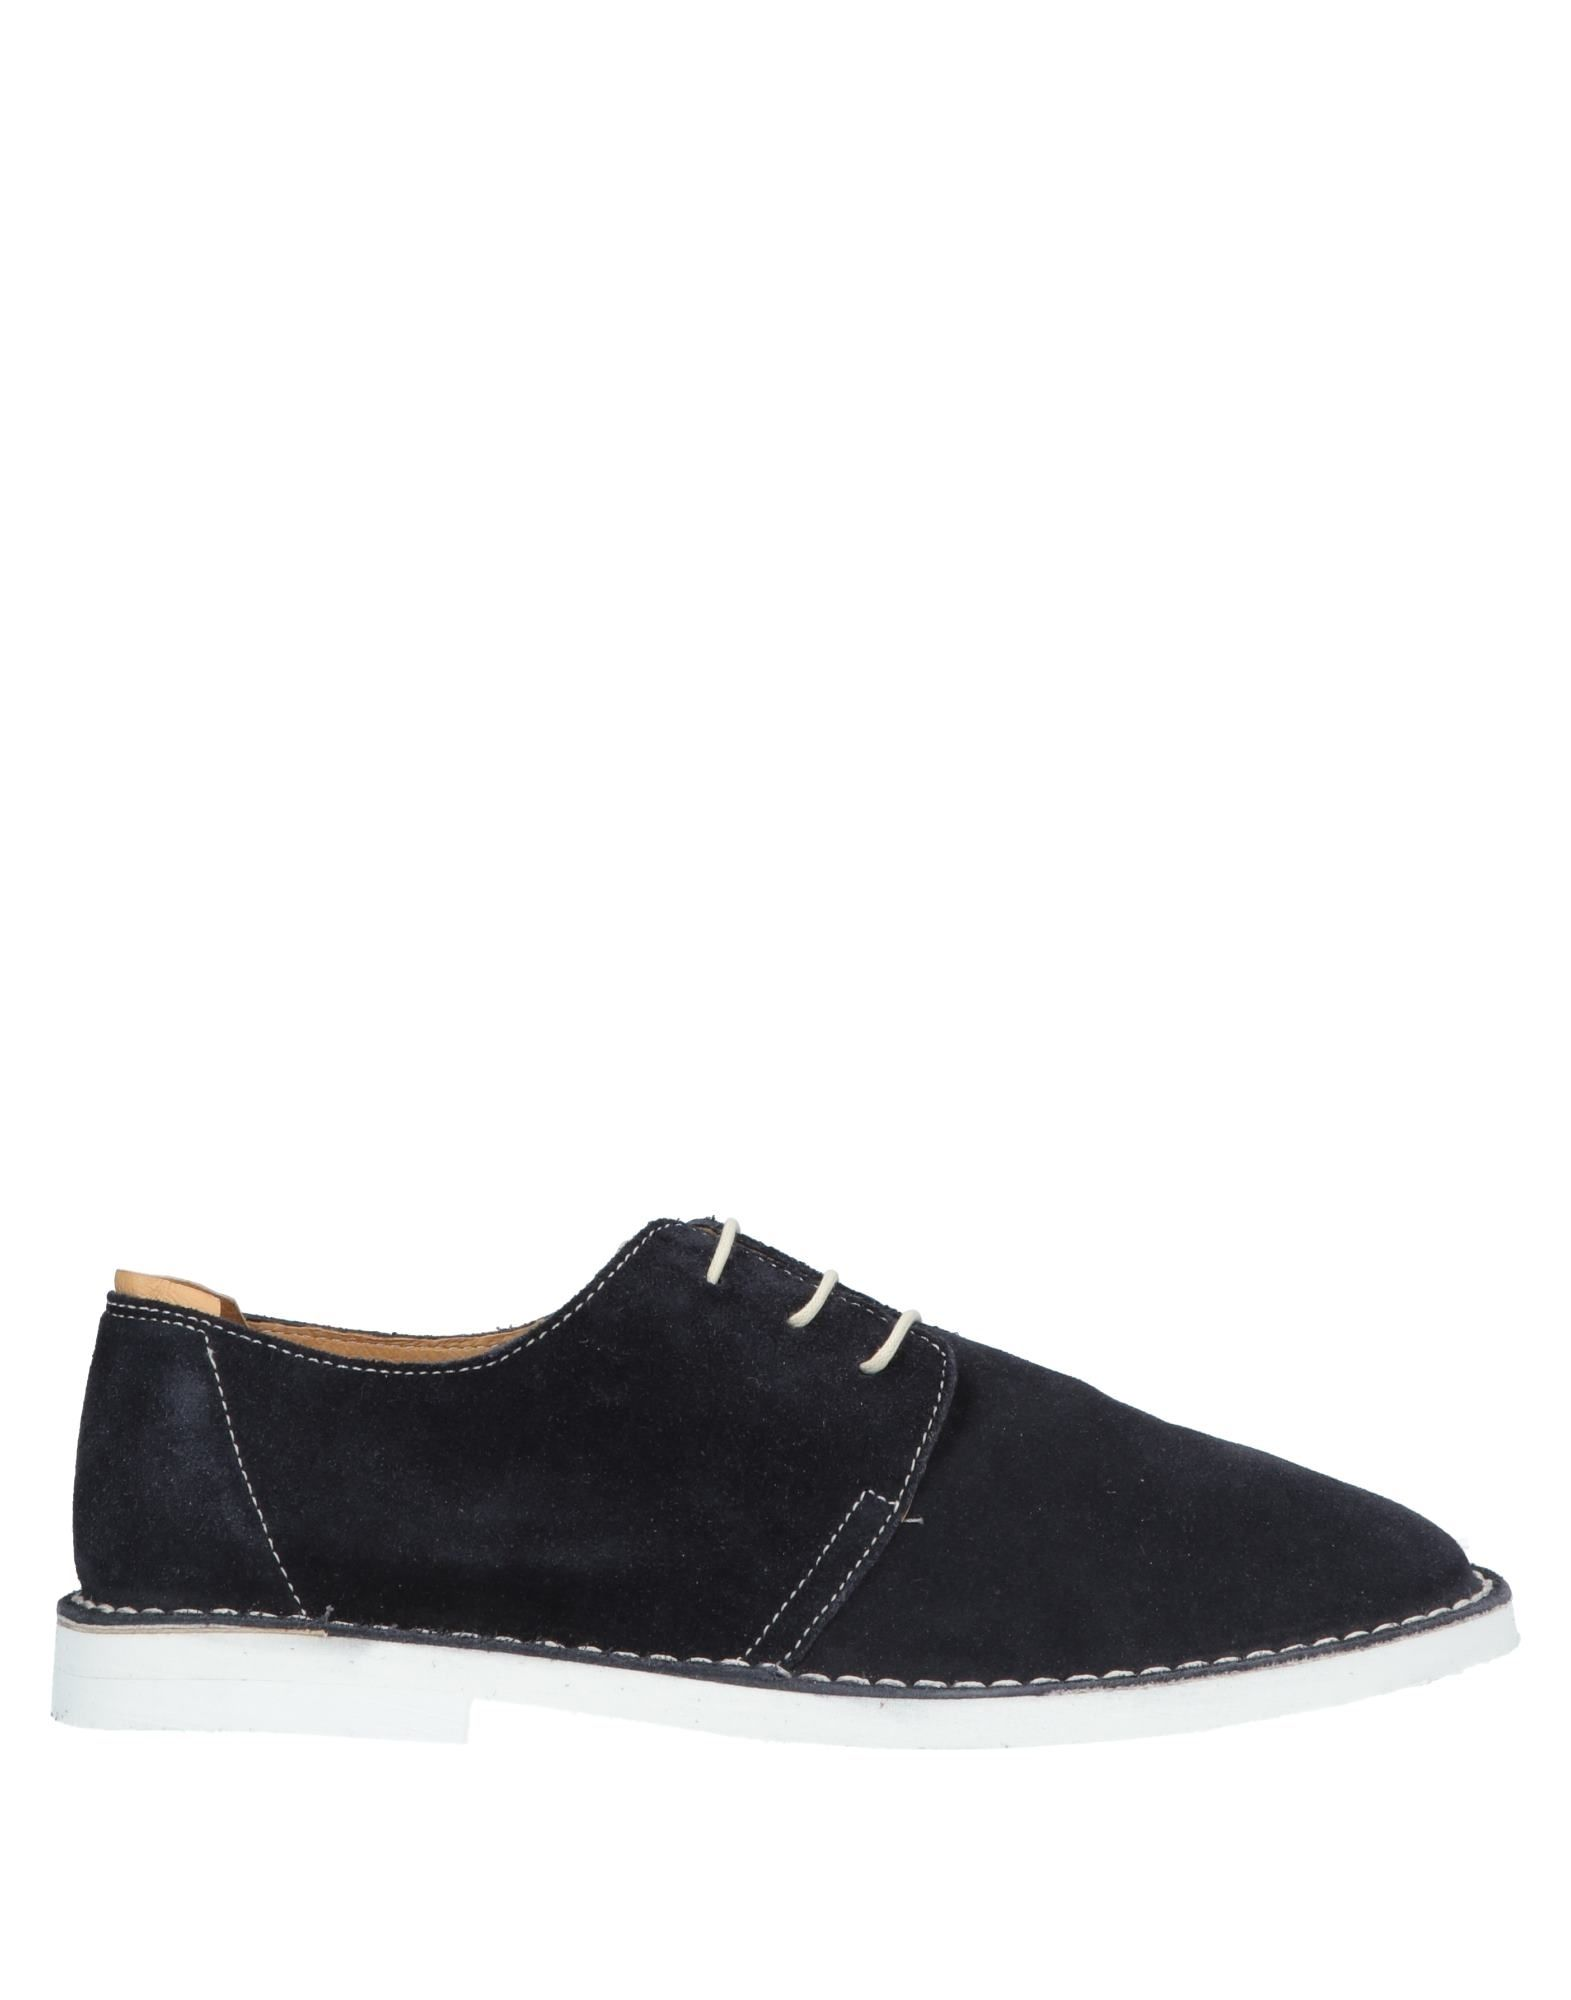 PANELLA Обувь на шнурках